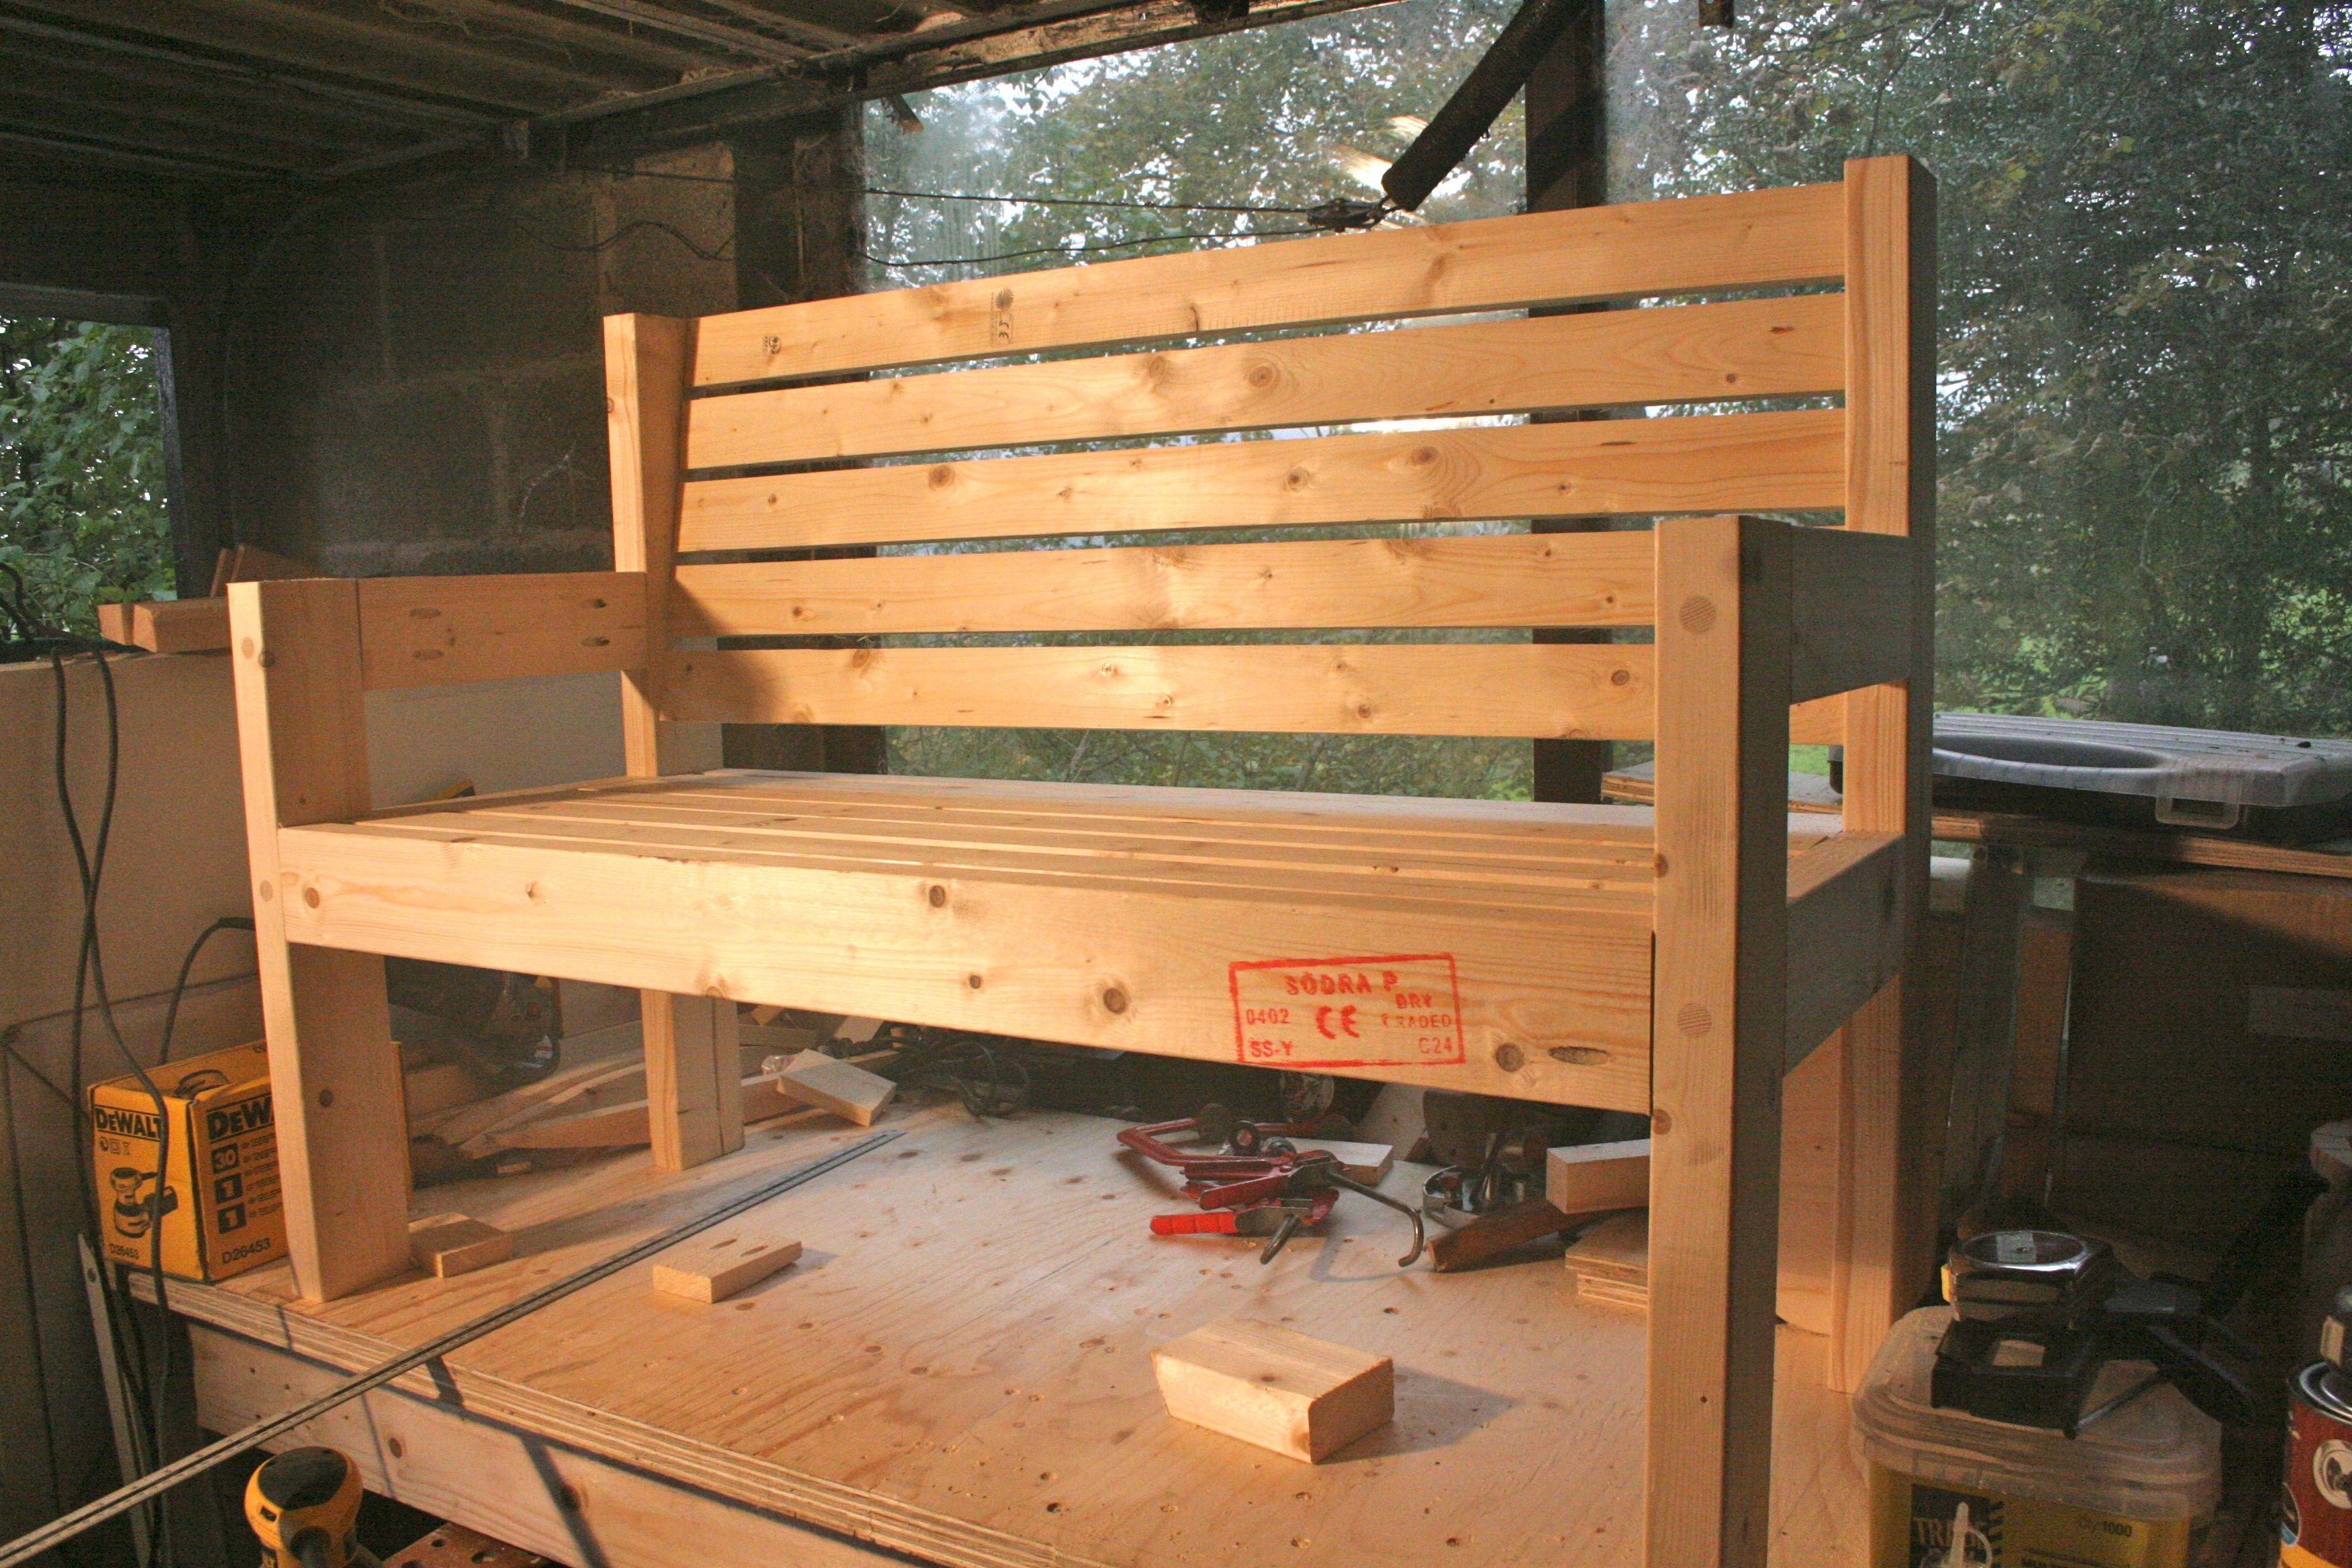 Simple Garden bench plans Diy furniture projects, Garden